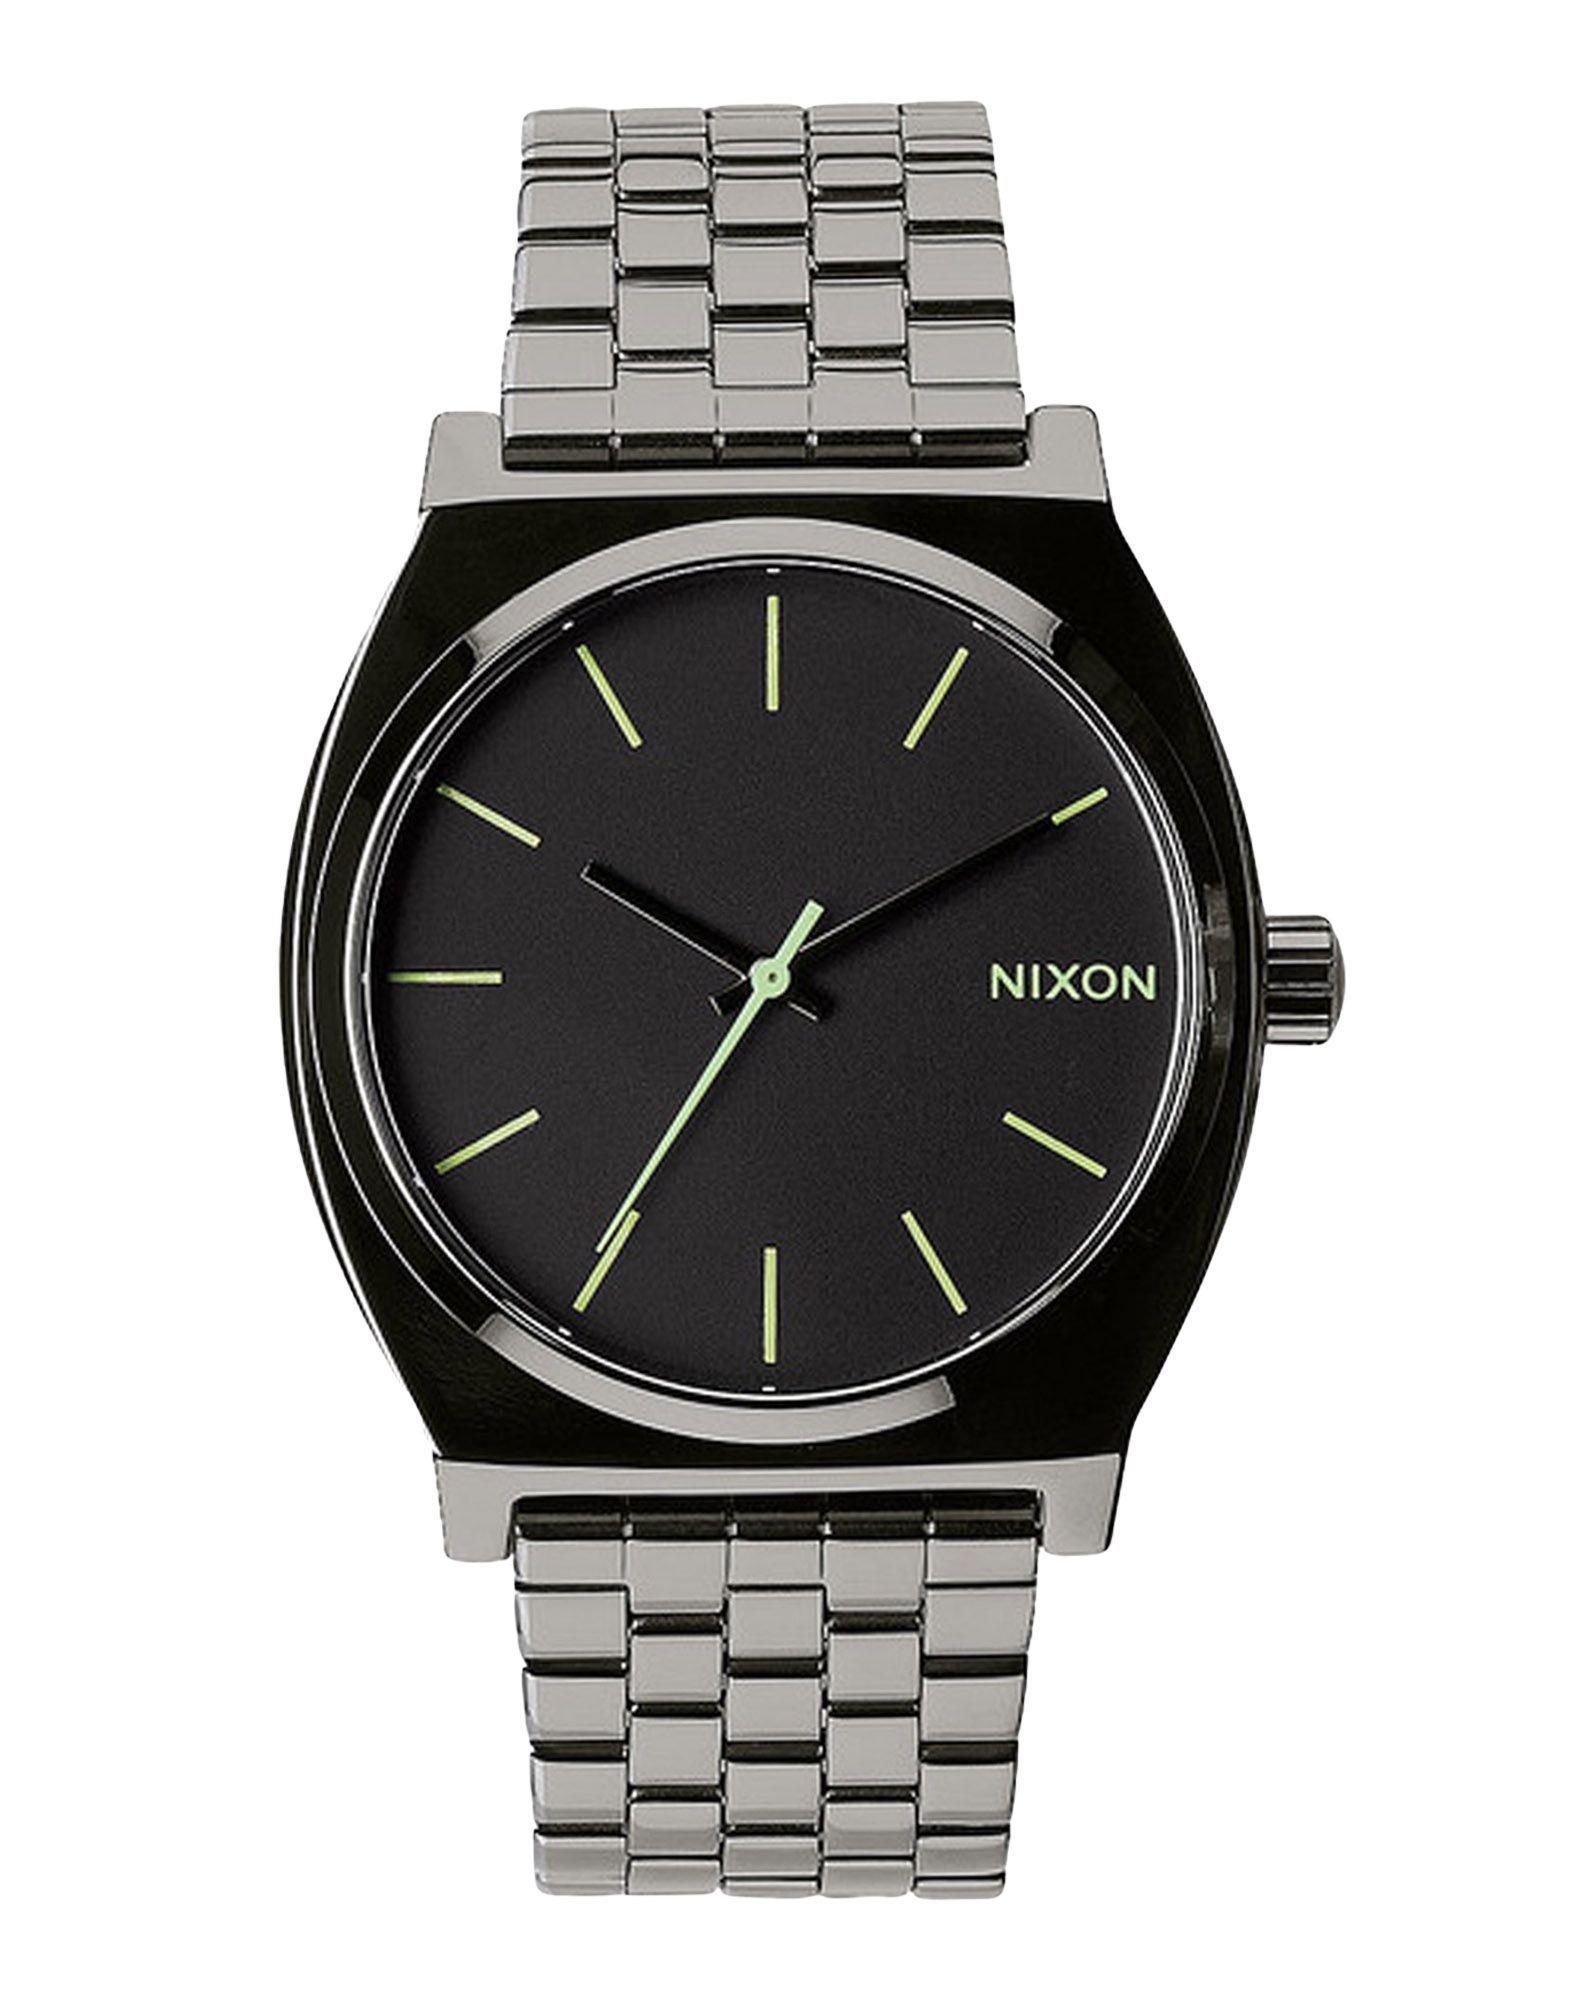 TIMEPIECES Unisex Nixon Steel grey Stainless Steel